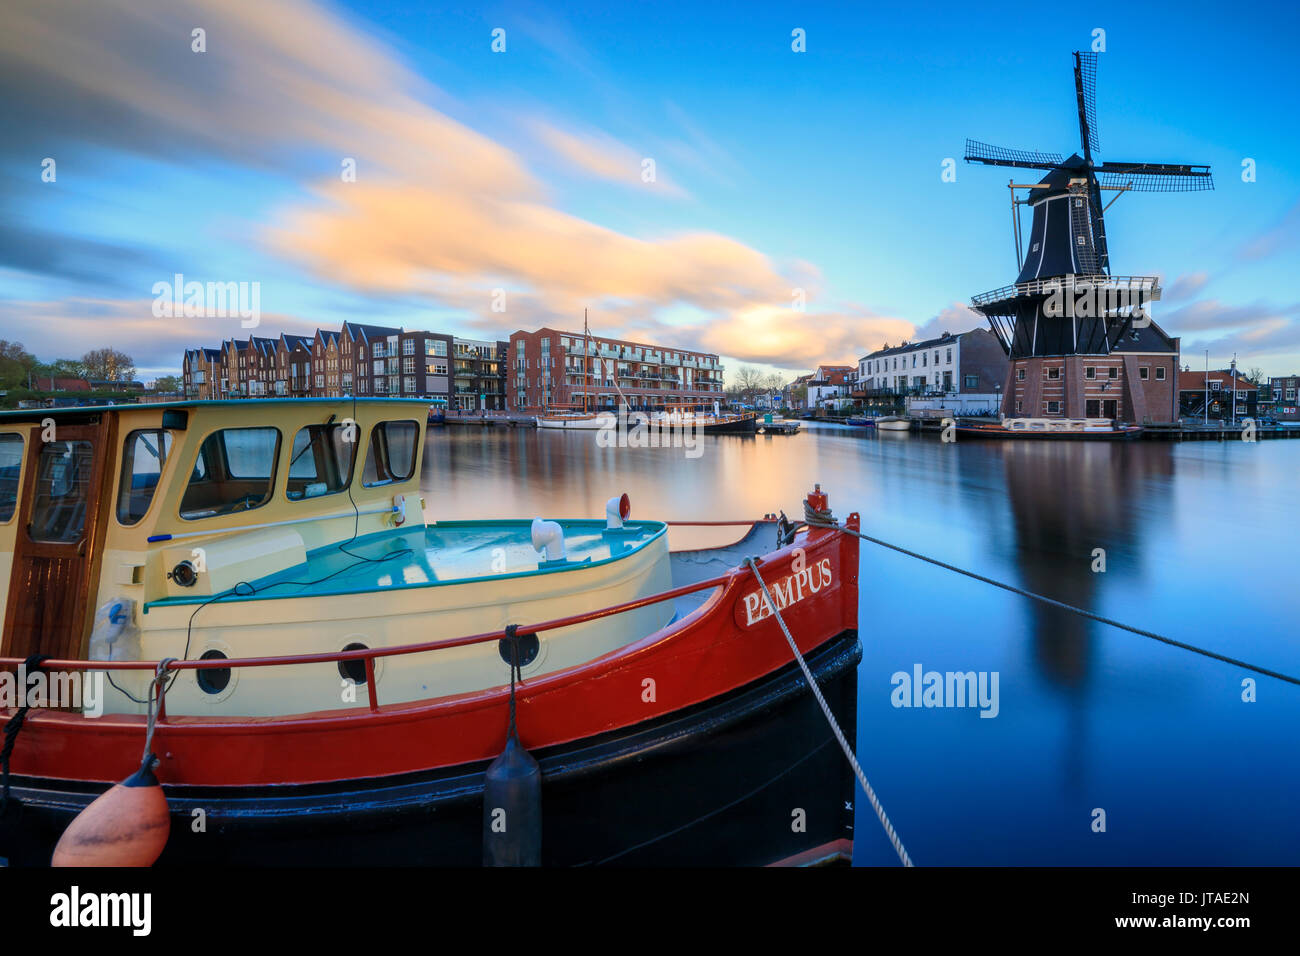 Boat Frames Stock Photos & Boat Frames Stock Images - Alamy